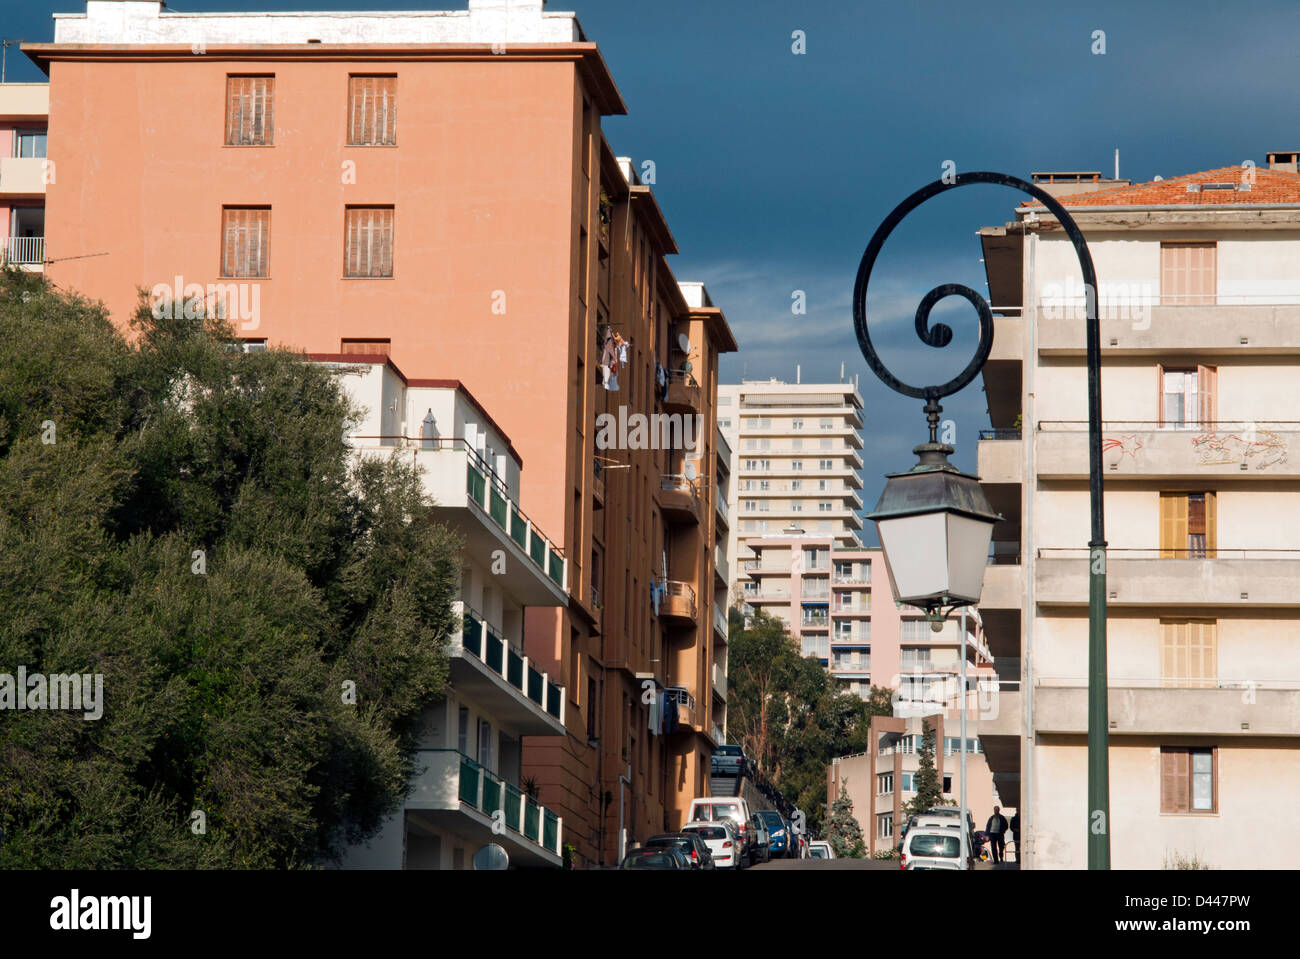 Modern city, Ajaccio, Corsica, France, Europe - Stock Image